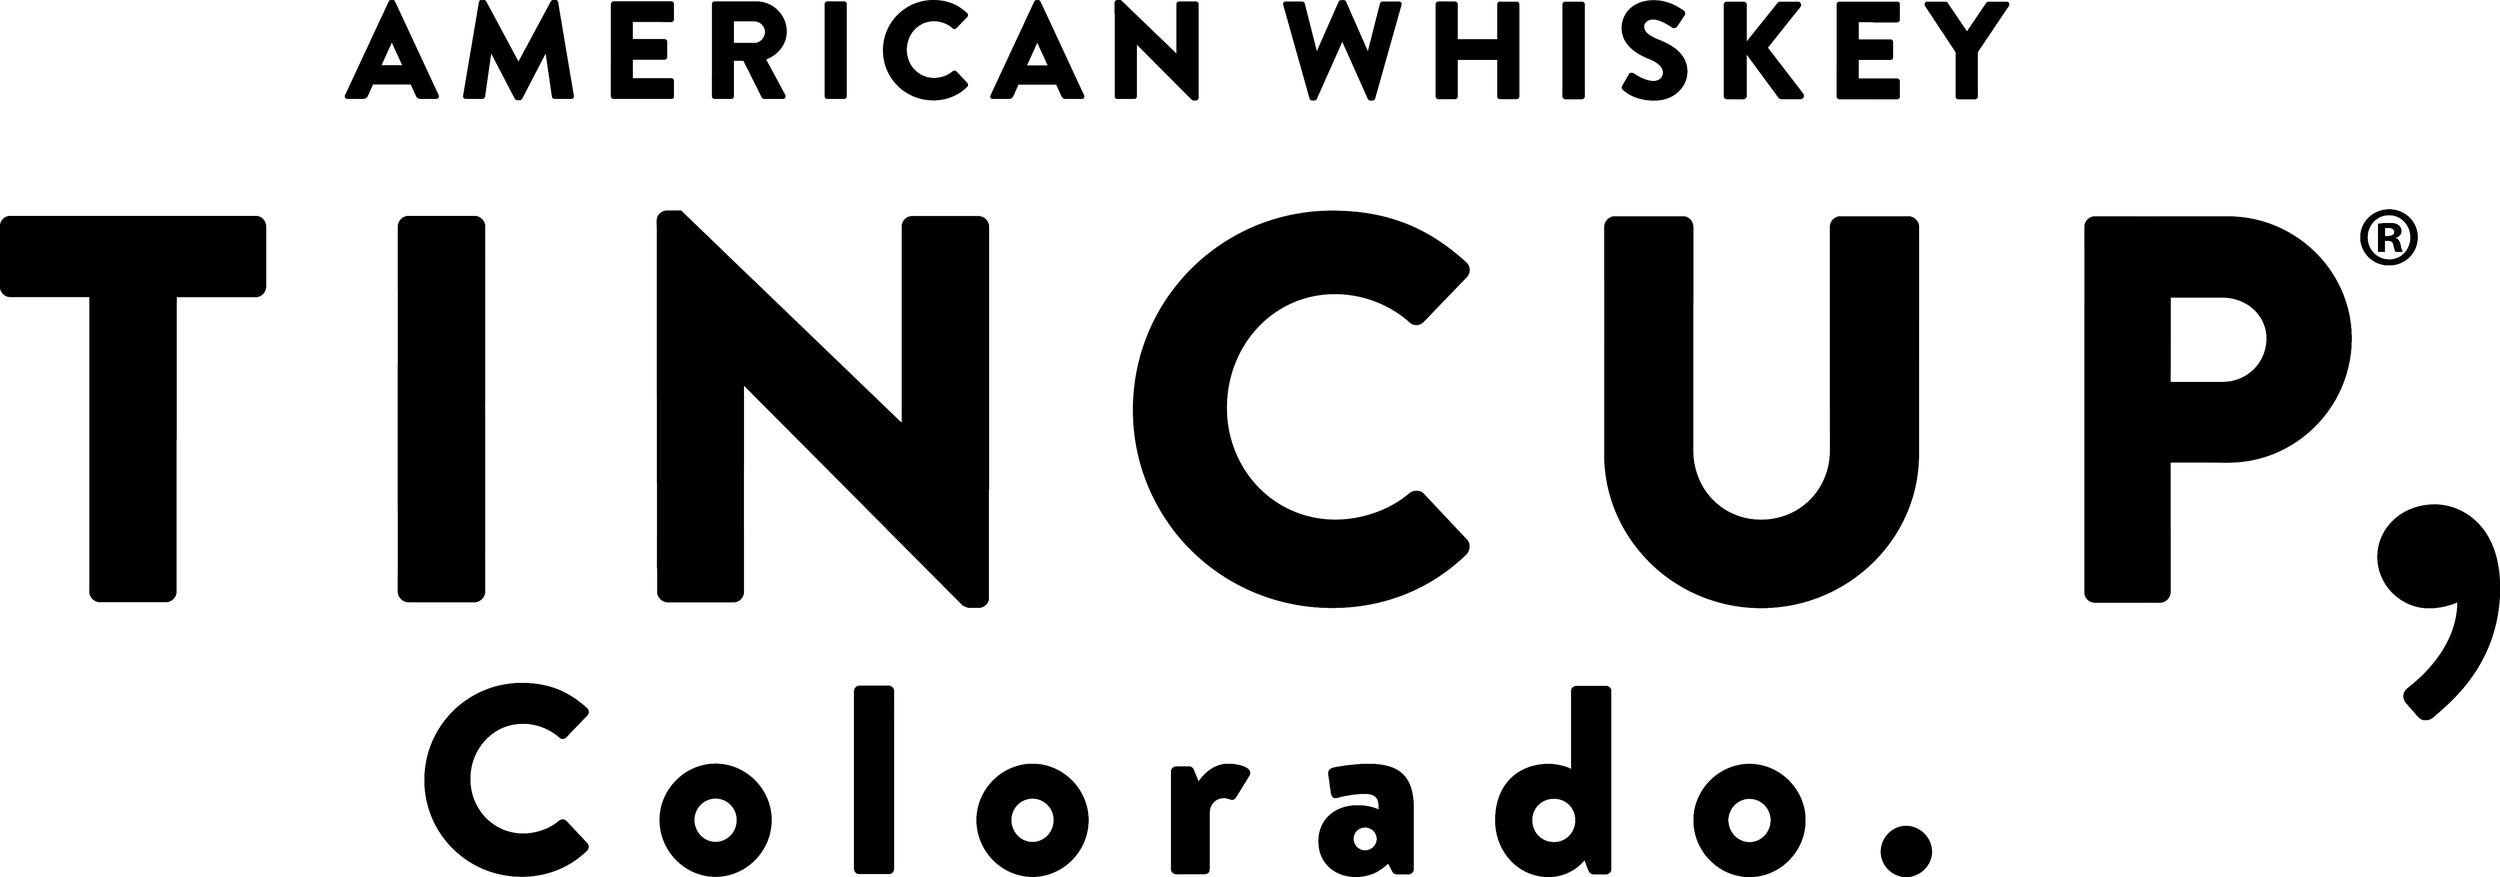 TINCUP full logo.jpg